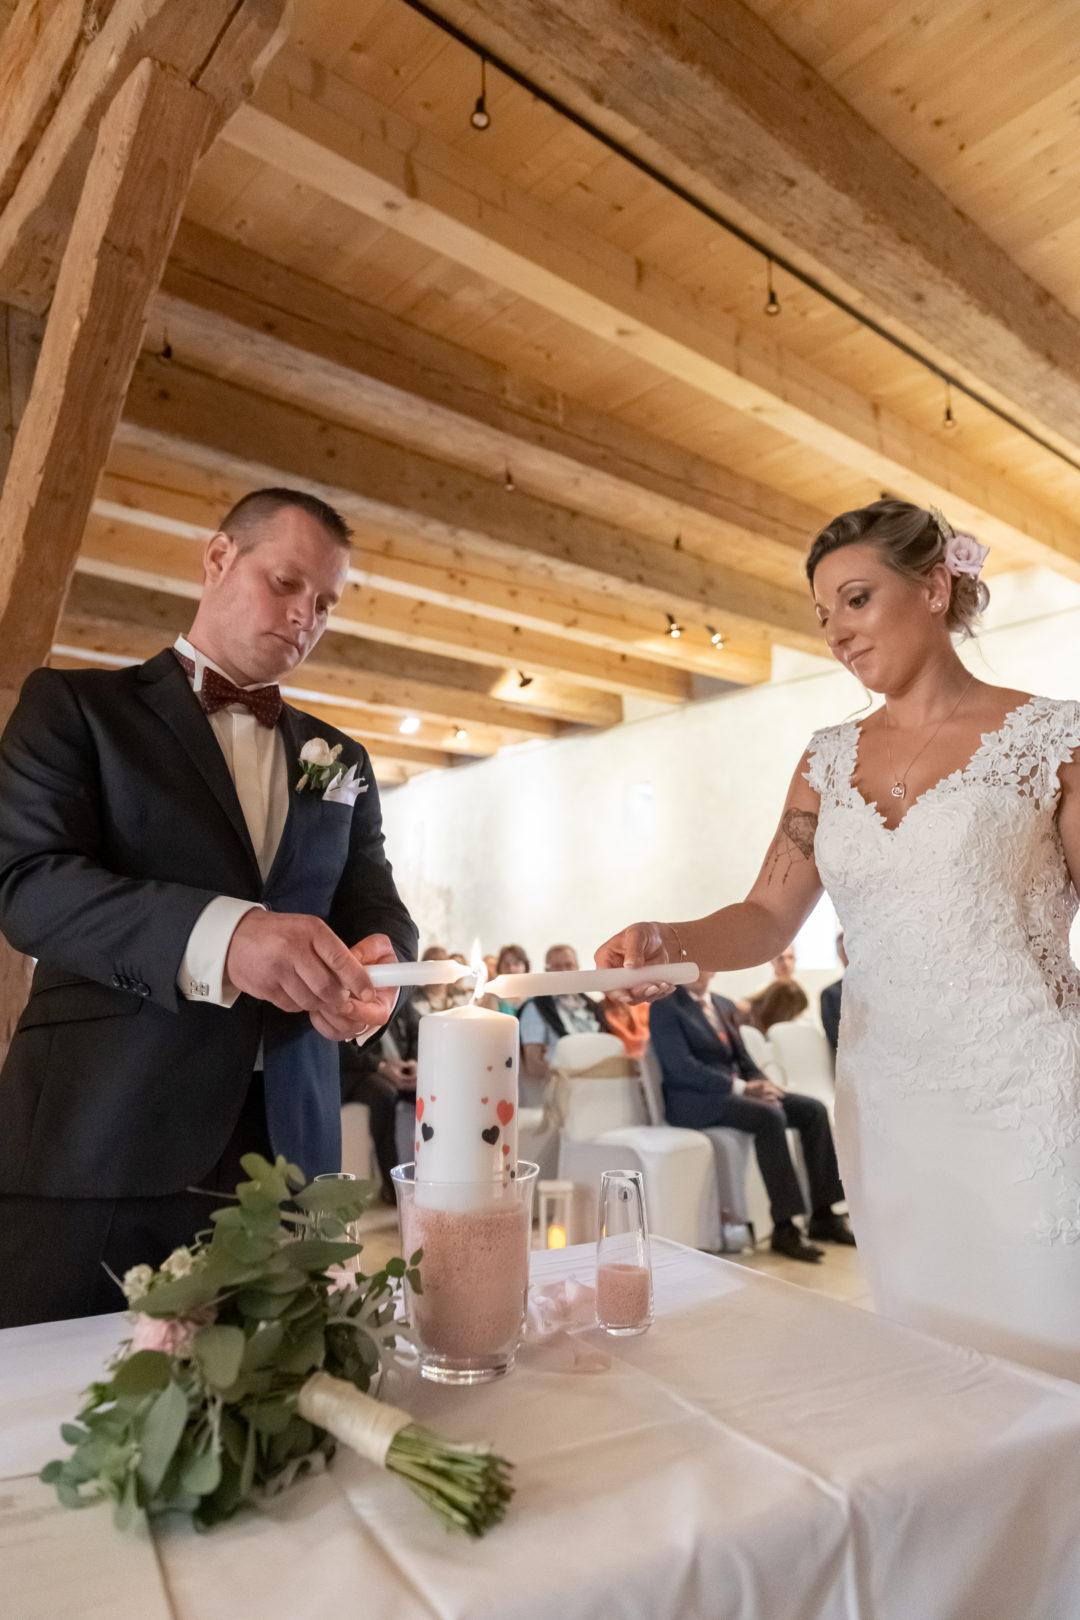 Rituel de la chandelle. Géraldine wedding planner. Wedding planner suisse